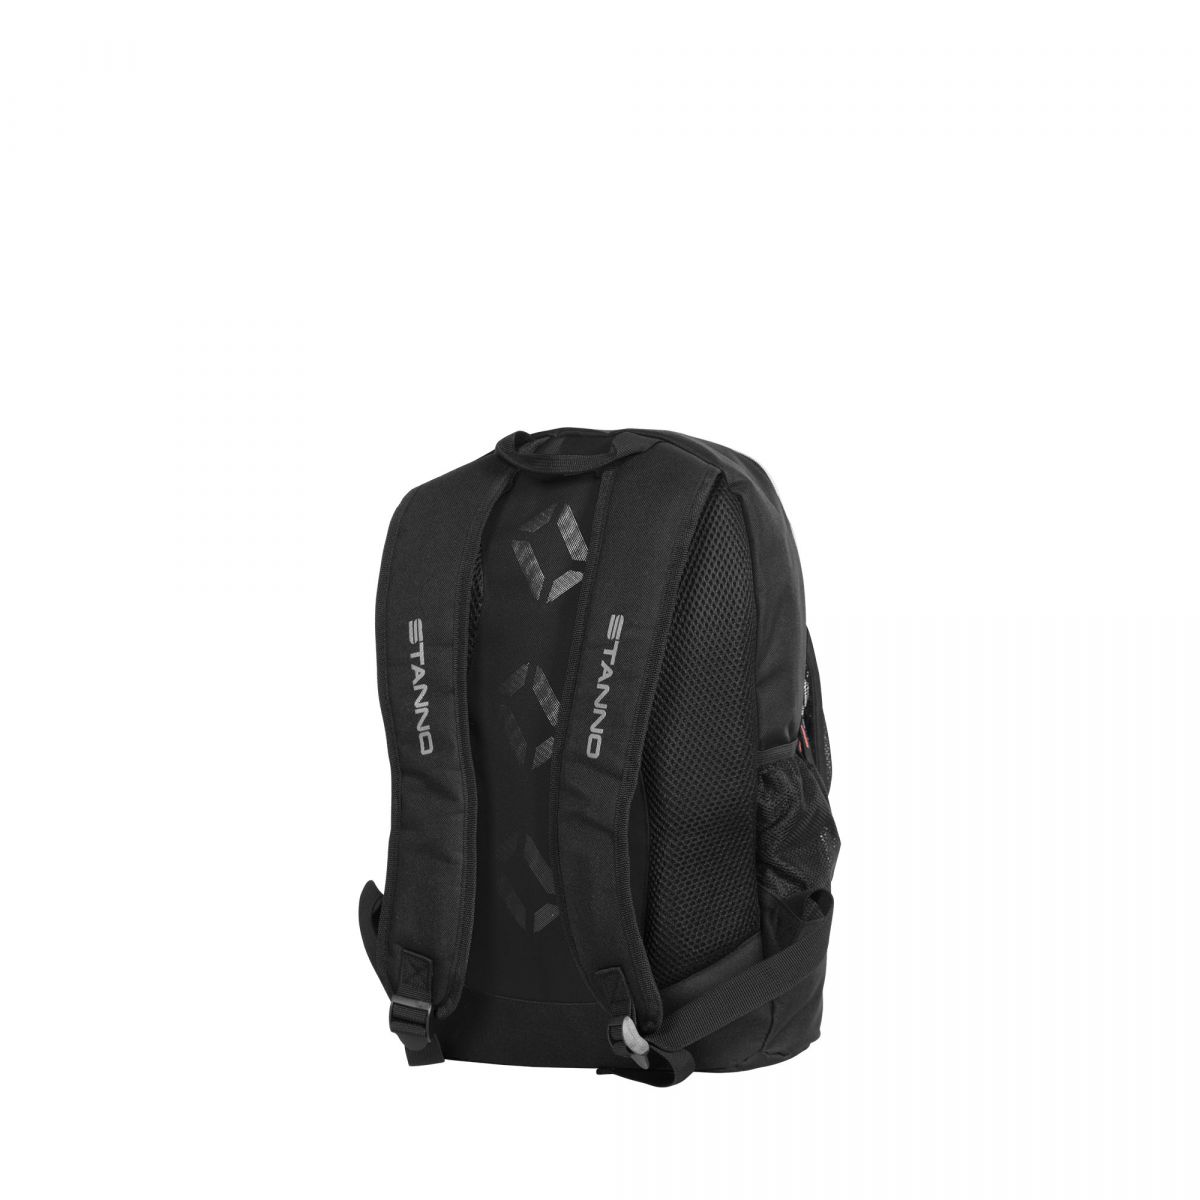 252288c0dfb Backpack met ballennet Backpack met ballennet Backpack met ballennet ...